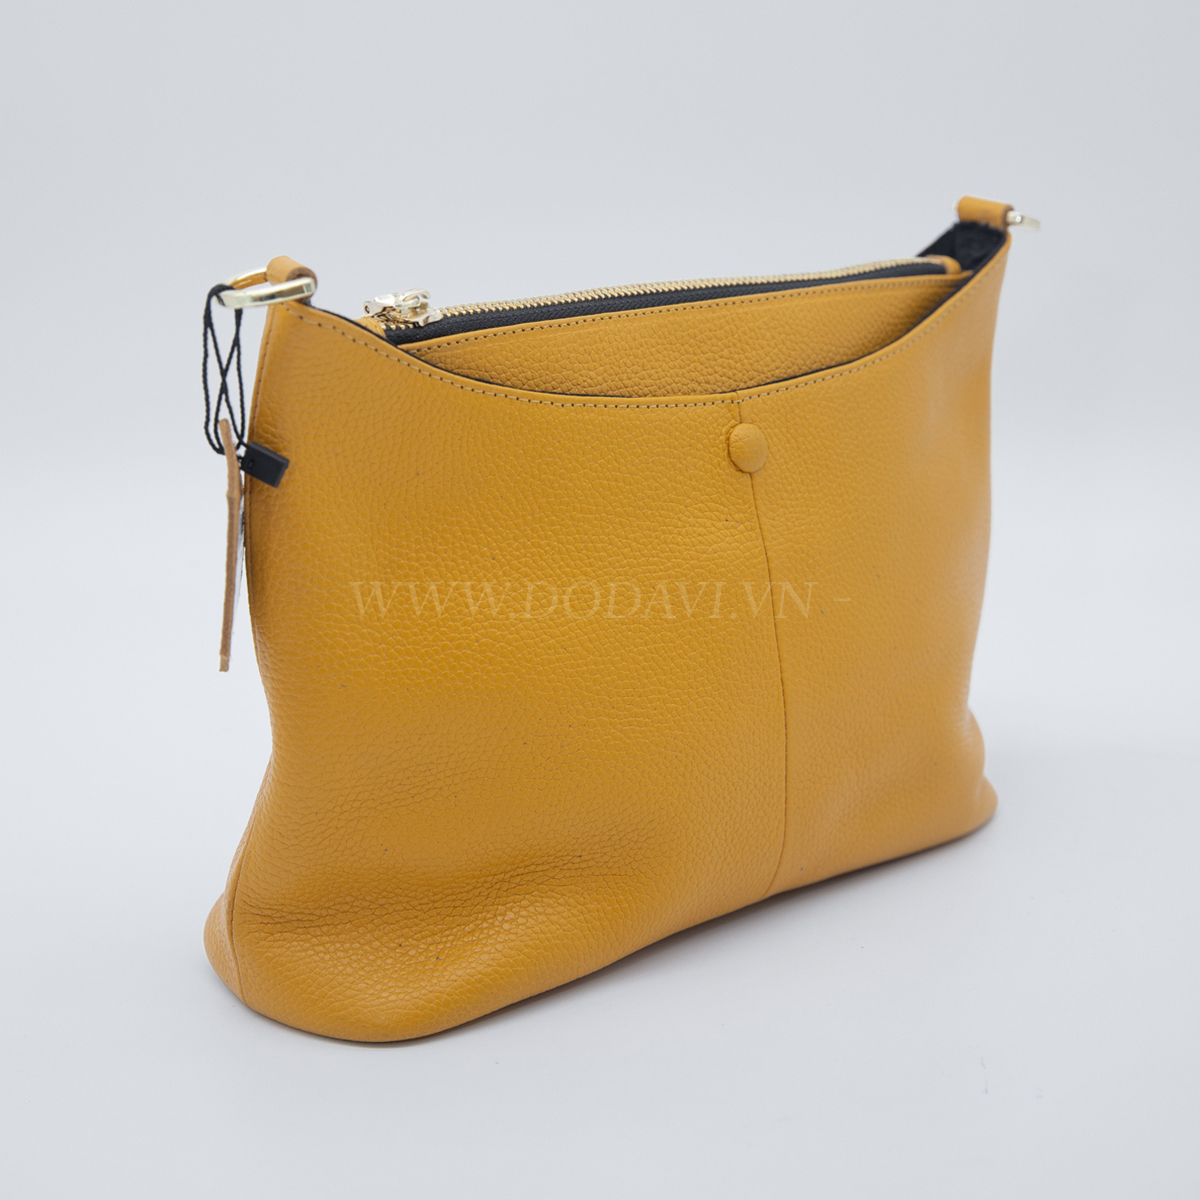 Túi đeo chéo L14v